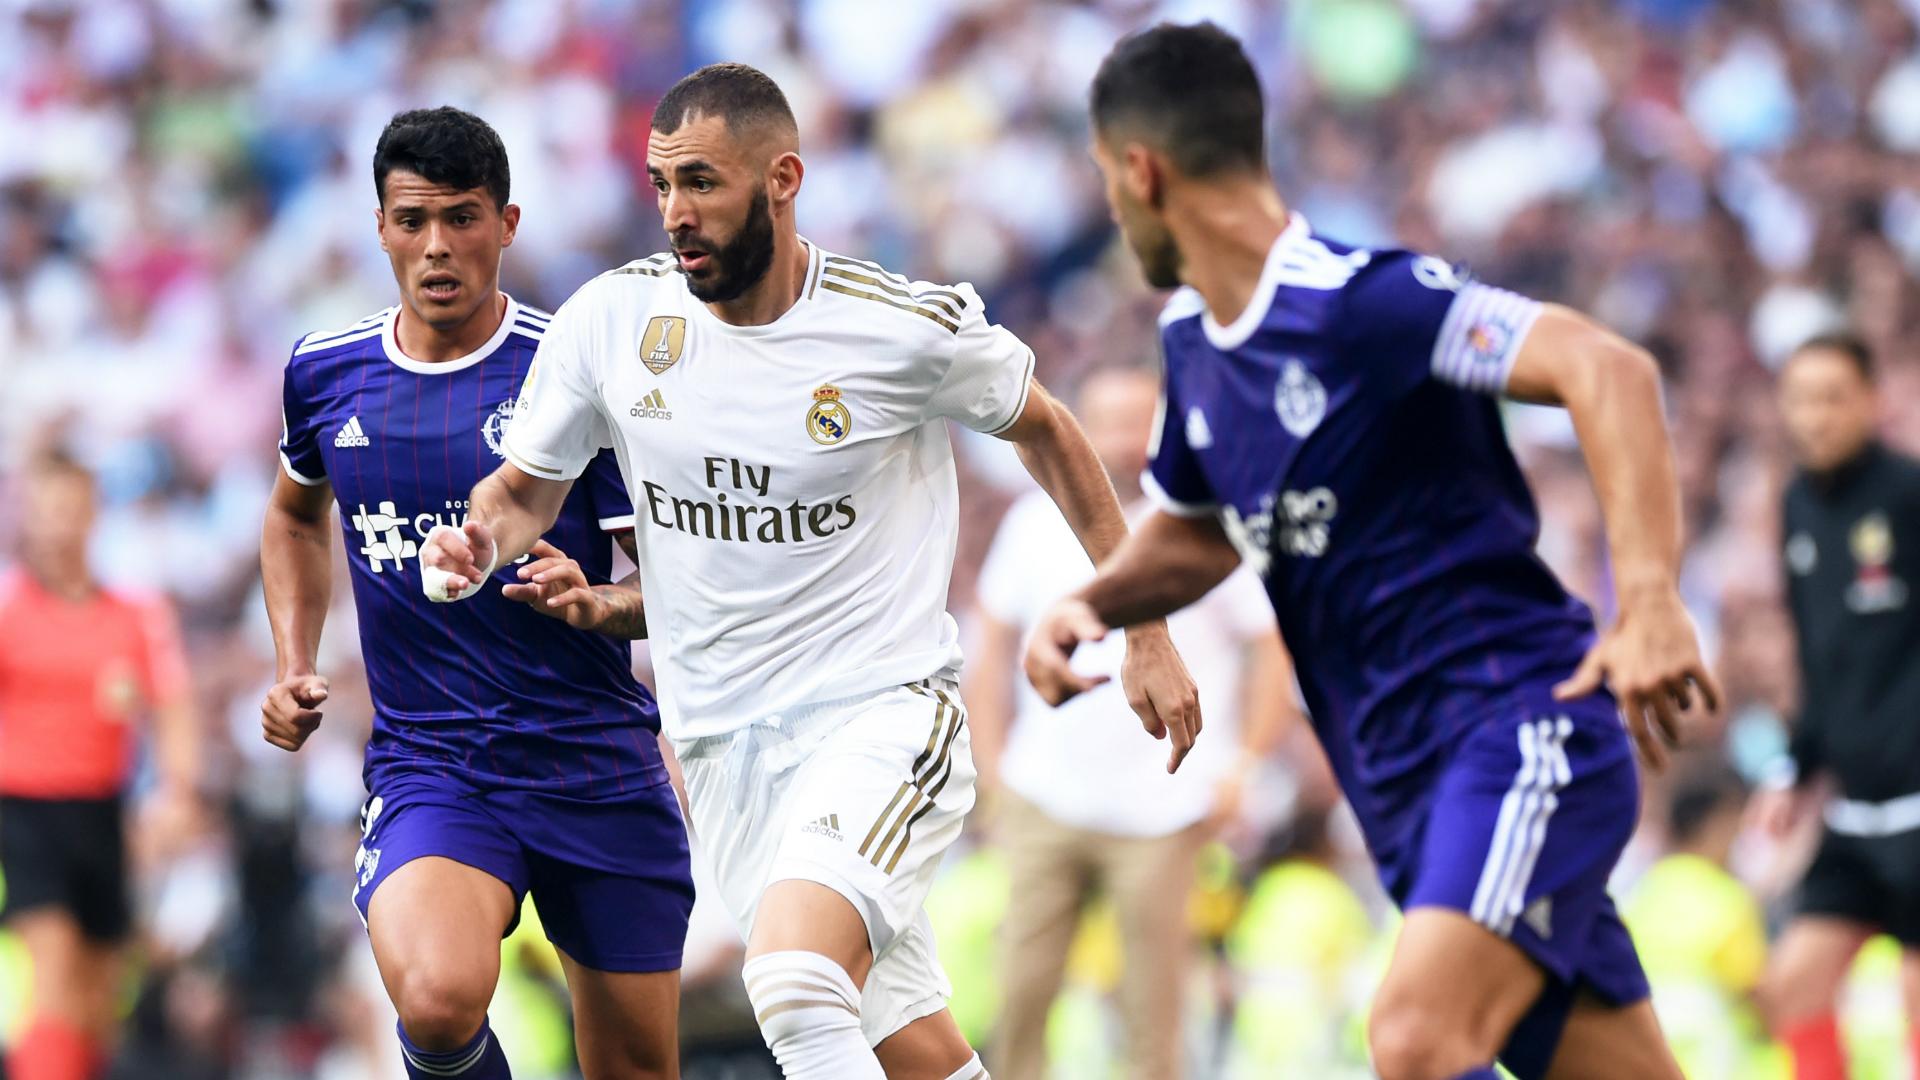 Real Madrid 1-1 Real Valladolid: Guardiola denies Zidane's men